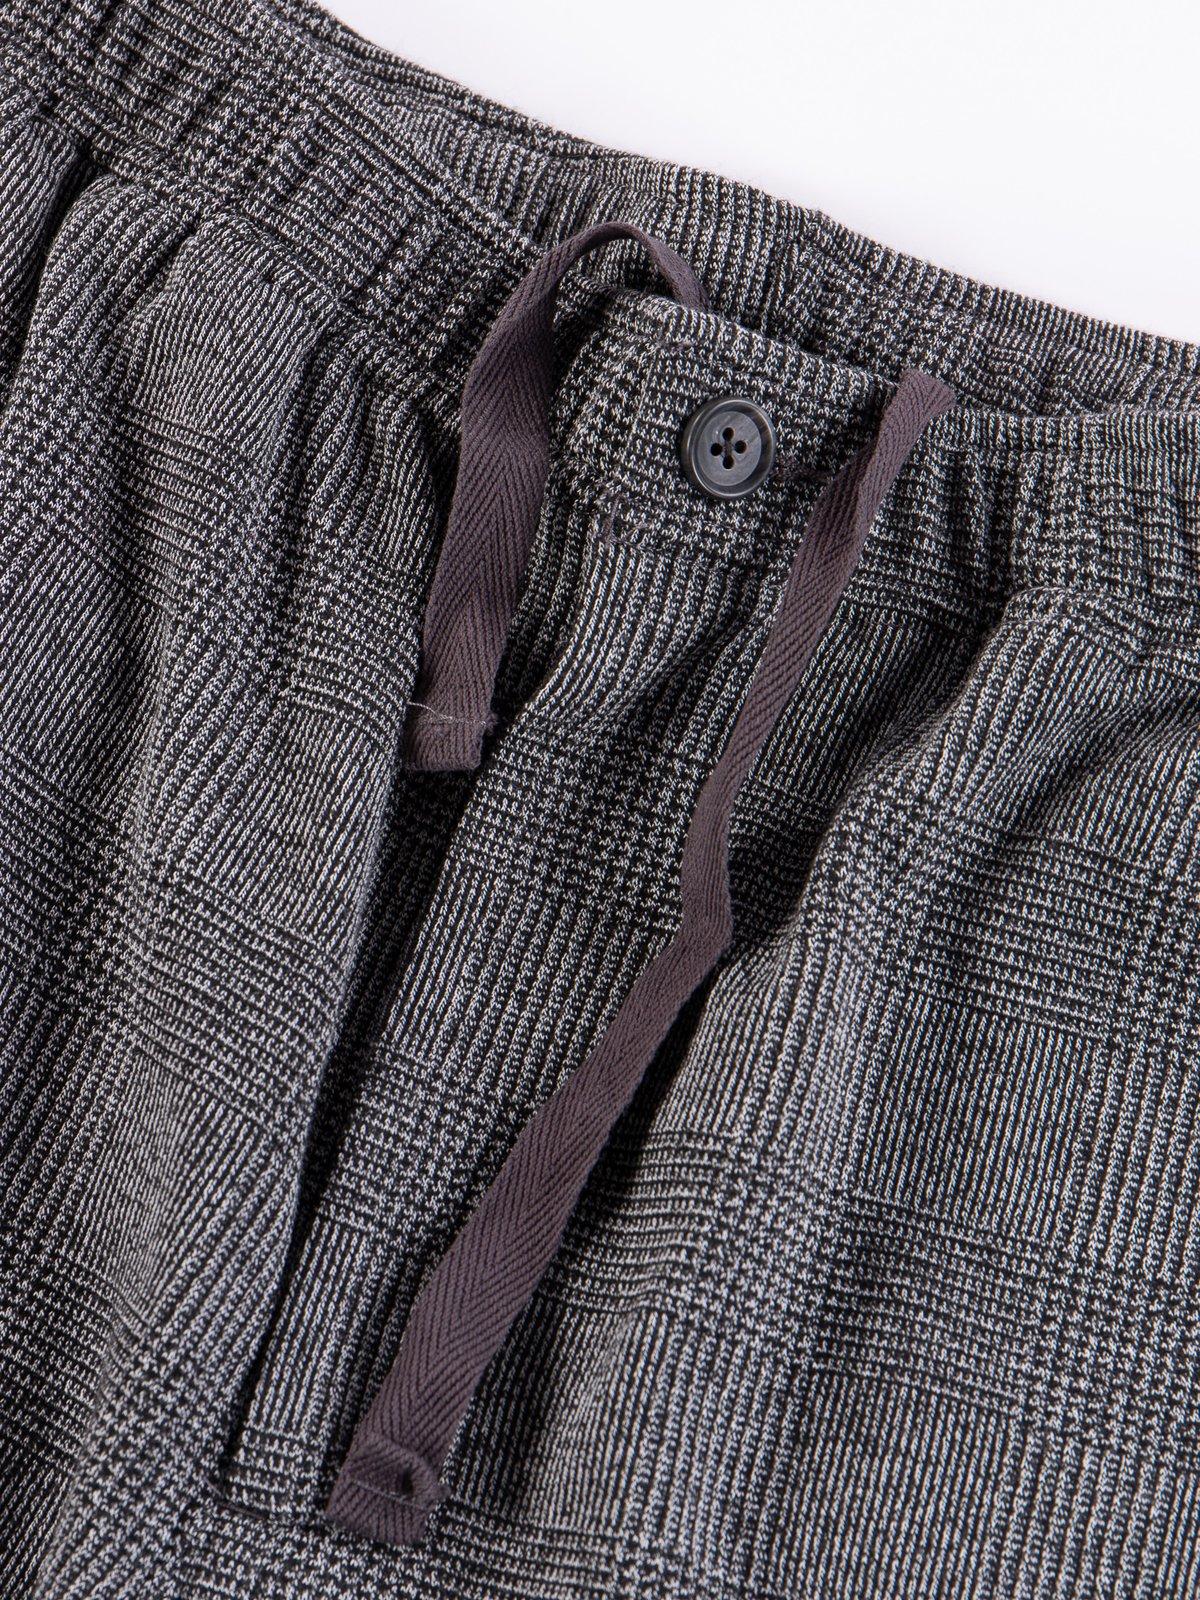 Grey PC Knit Glen Plaid Jog Pant - Image 6